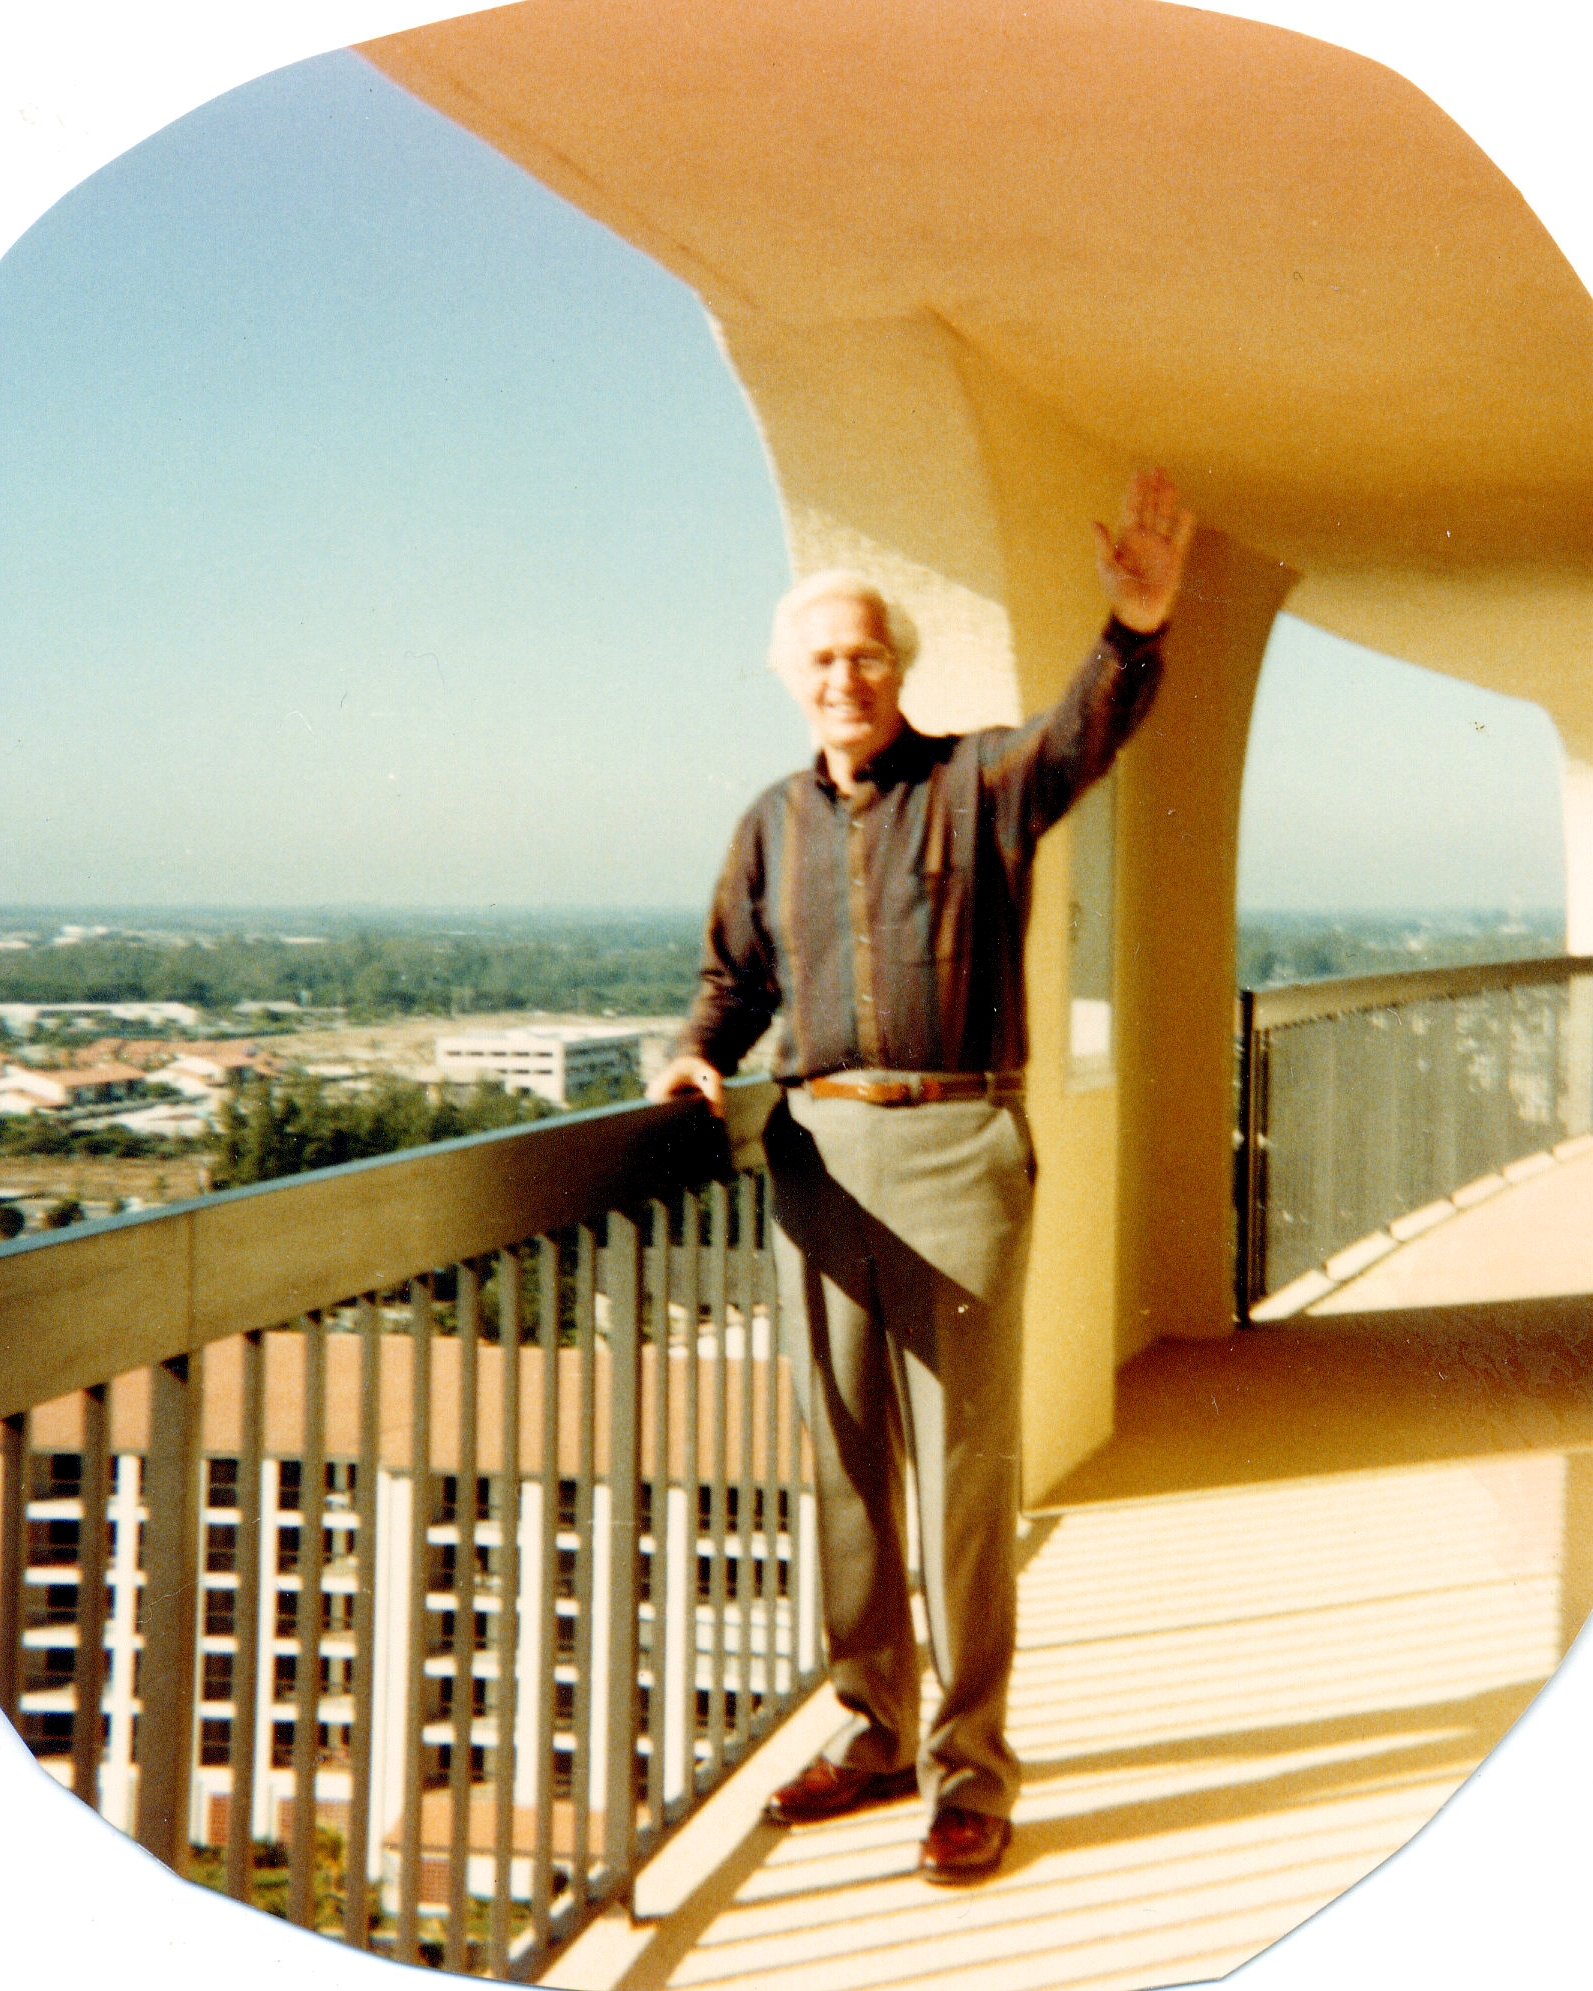 Larry Lambert at Jupiter condos (c) 1988